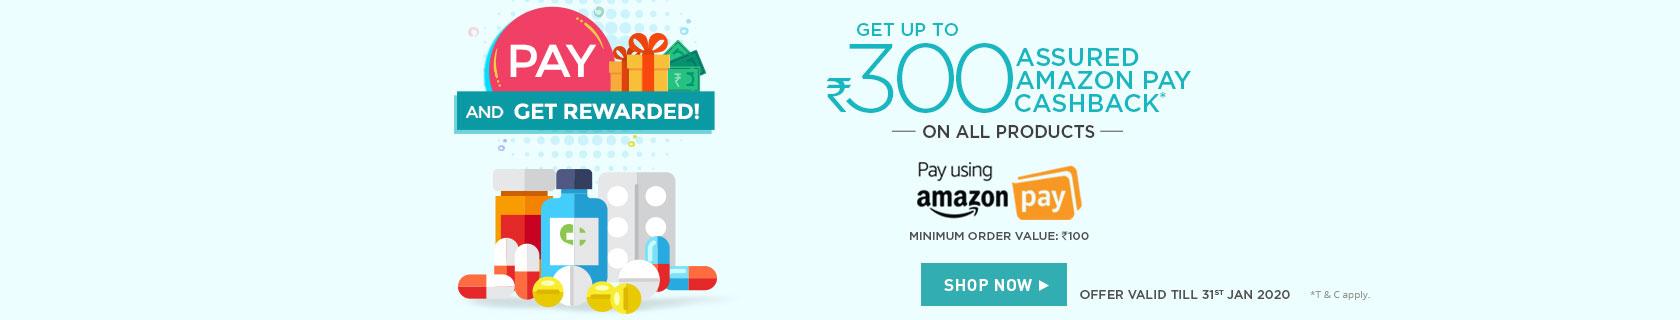 Amazon Pay Cashback Offer